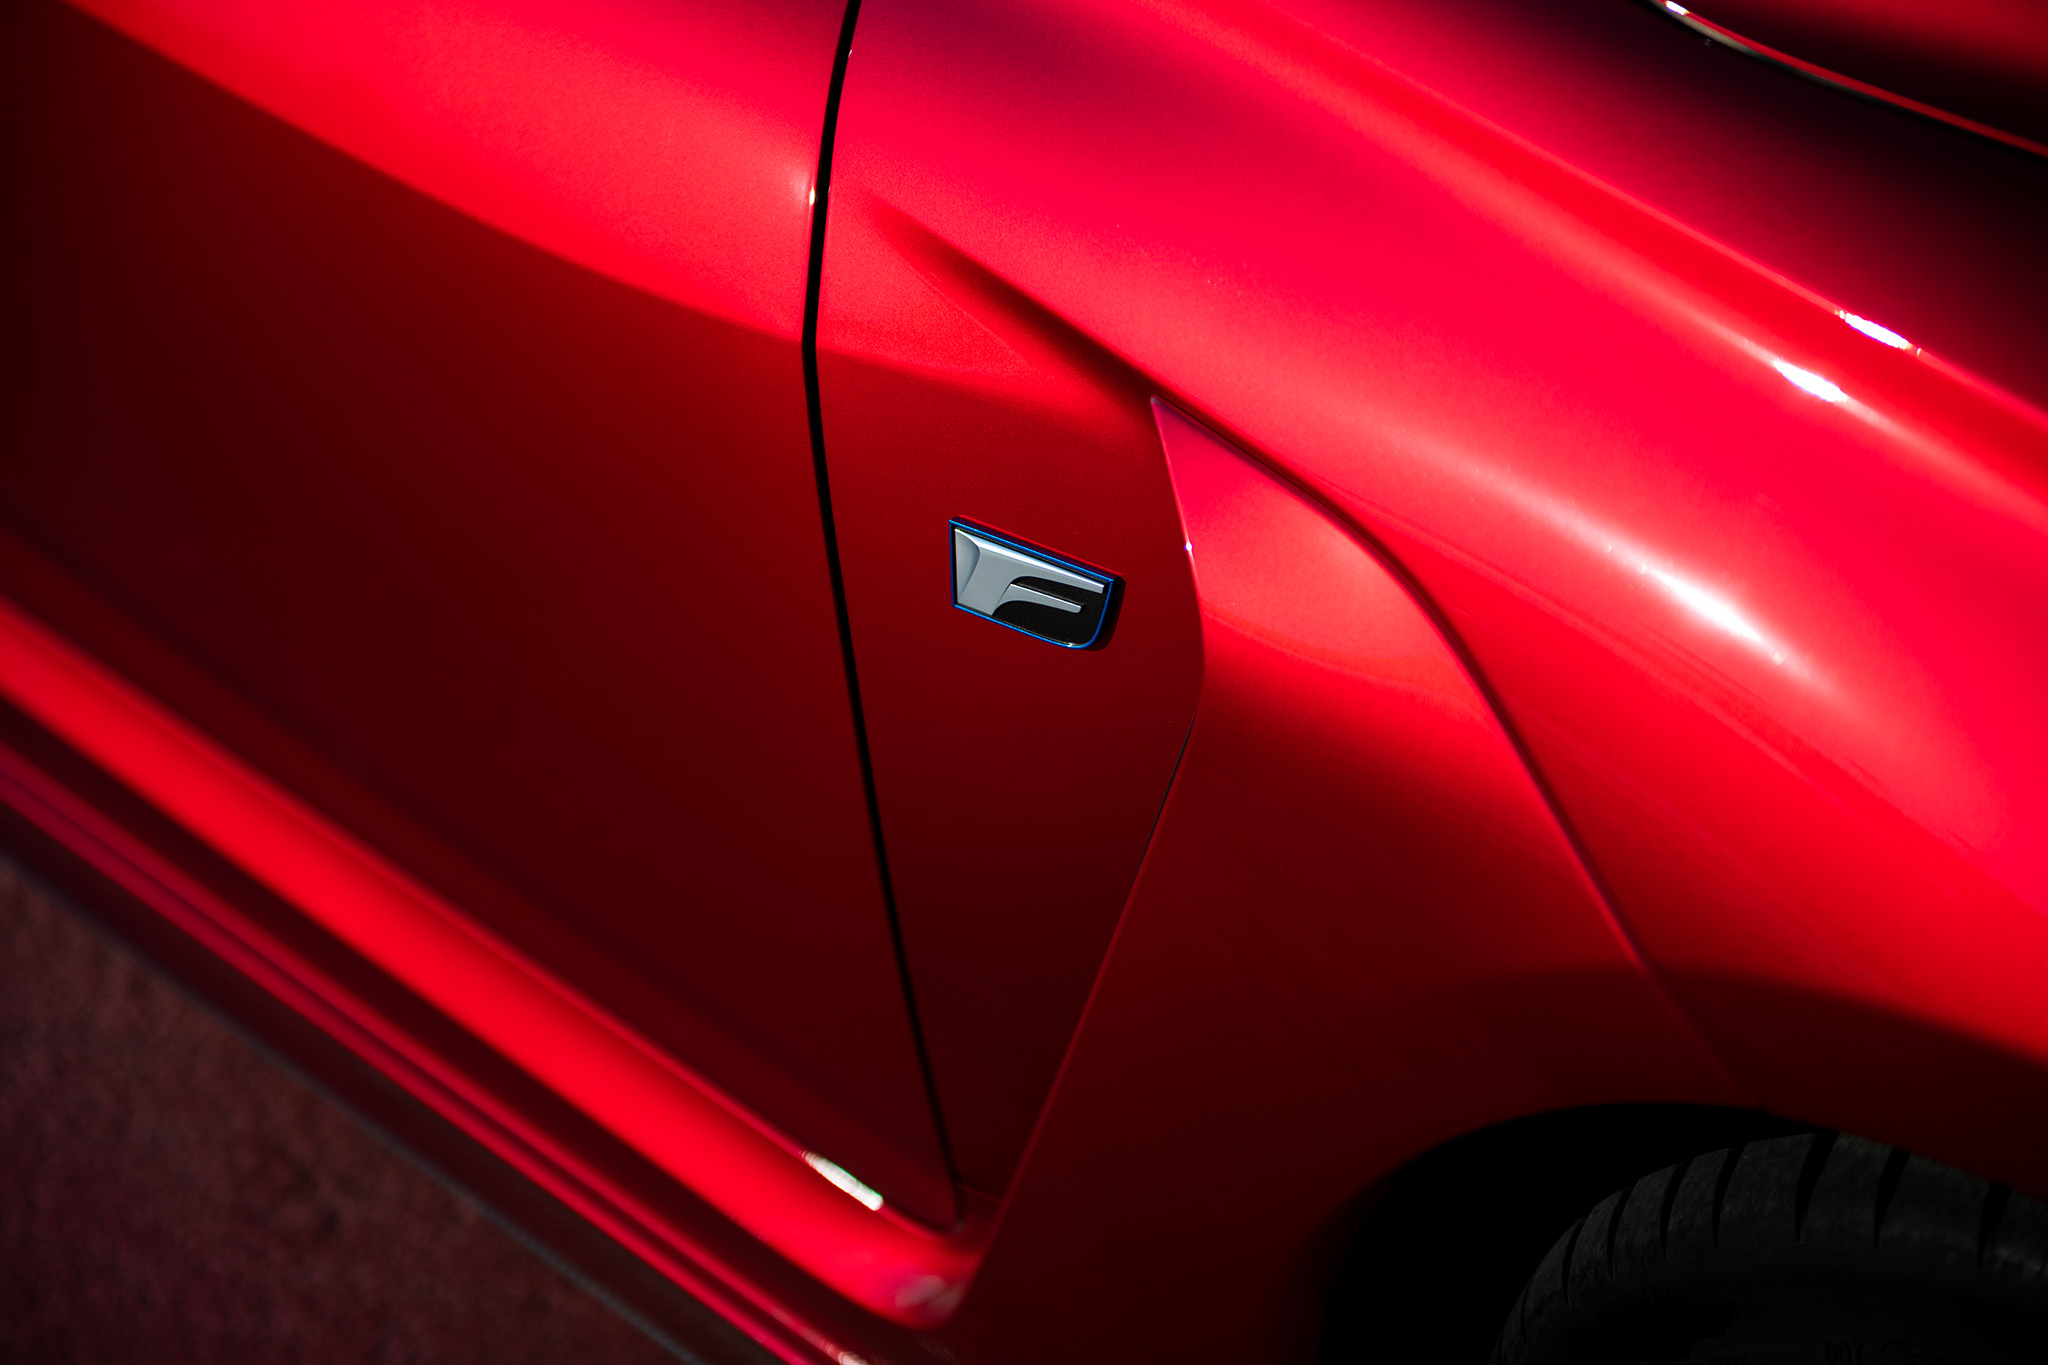 Lexus F Sport close-up badge detail